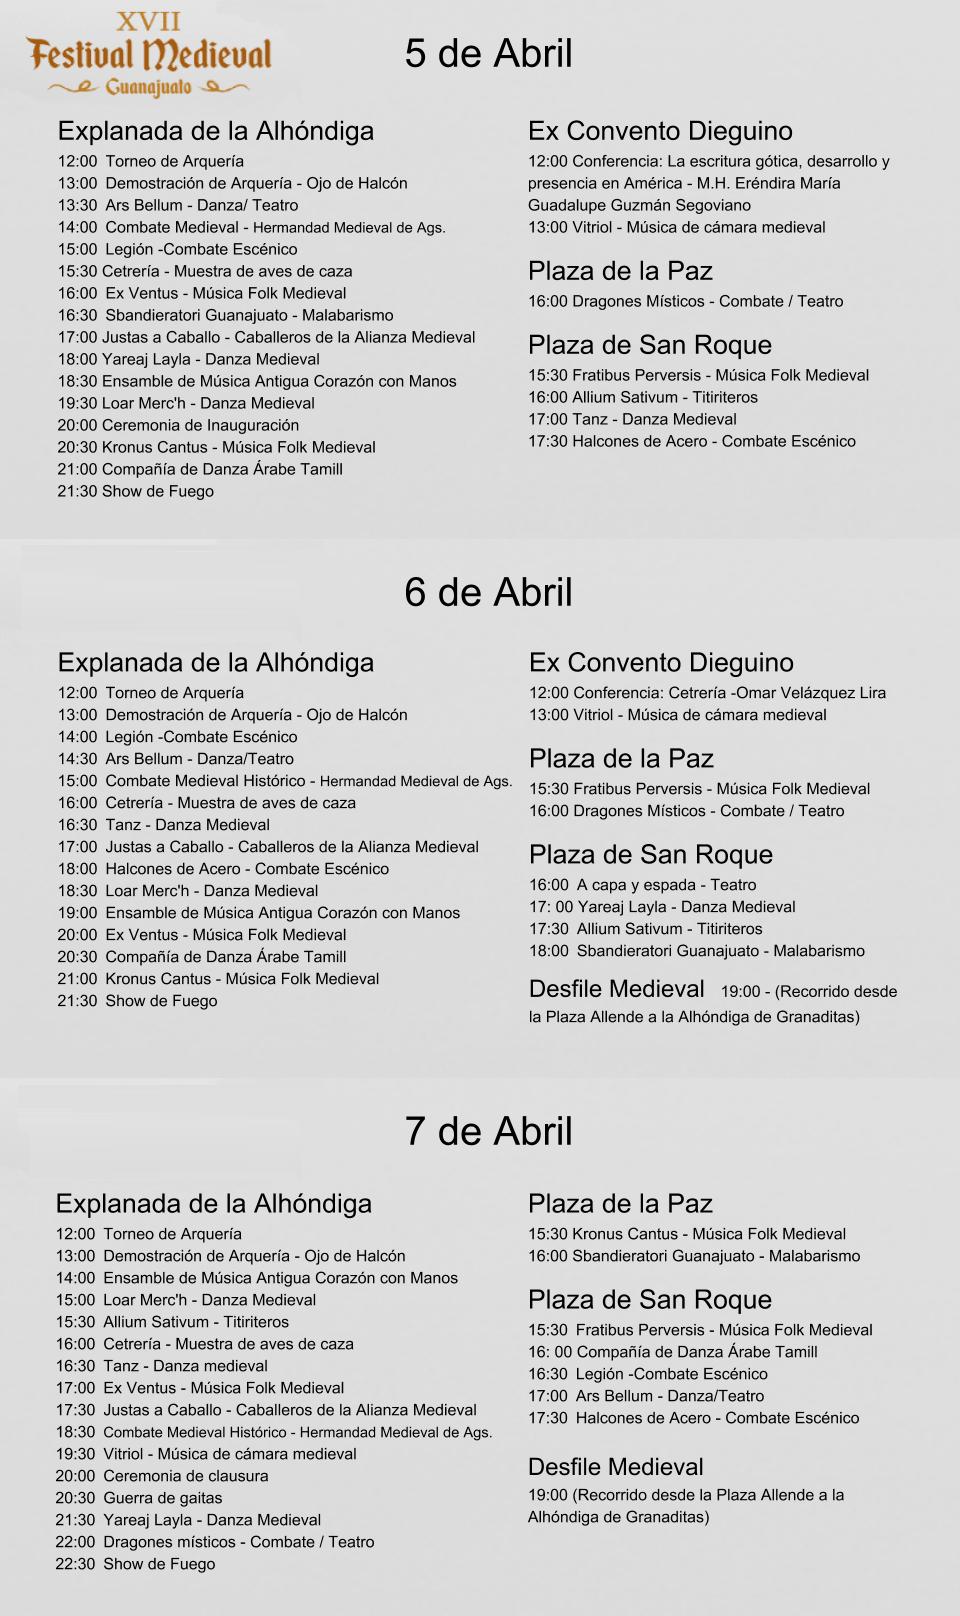 Programa Festival Medieval Guanajuato 2018